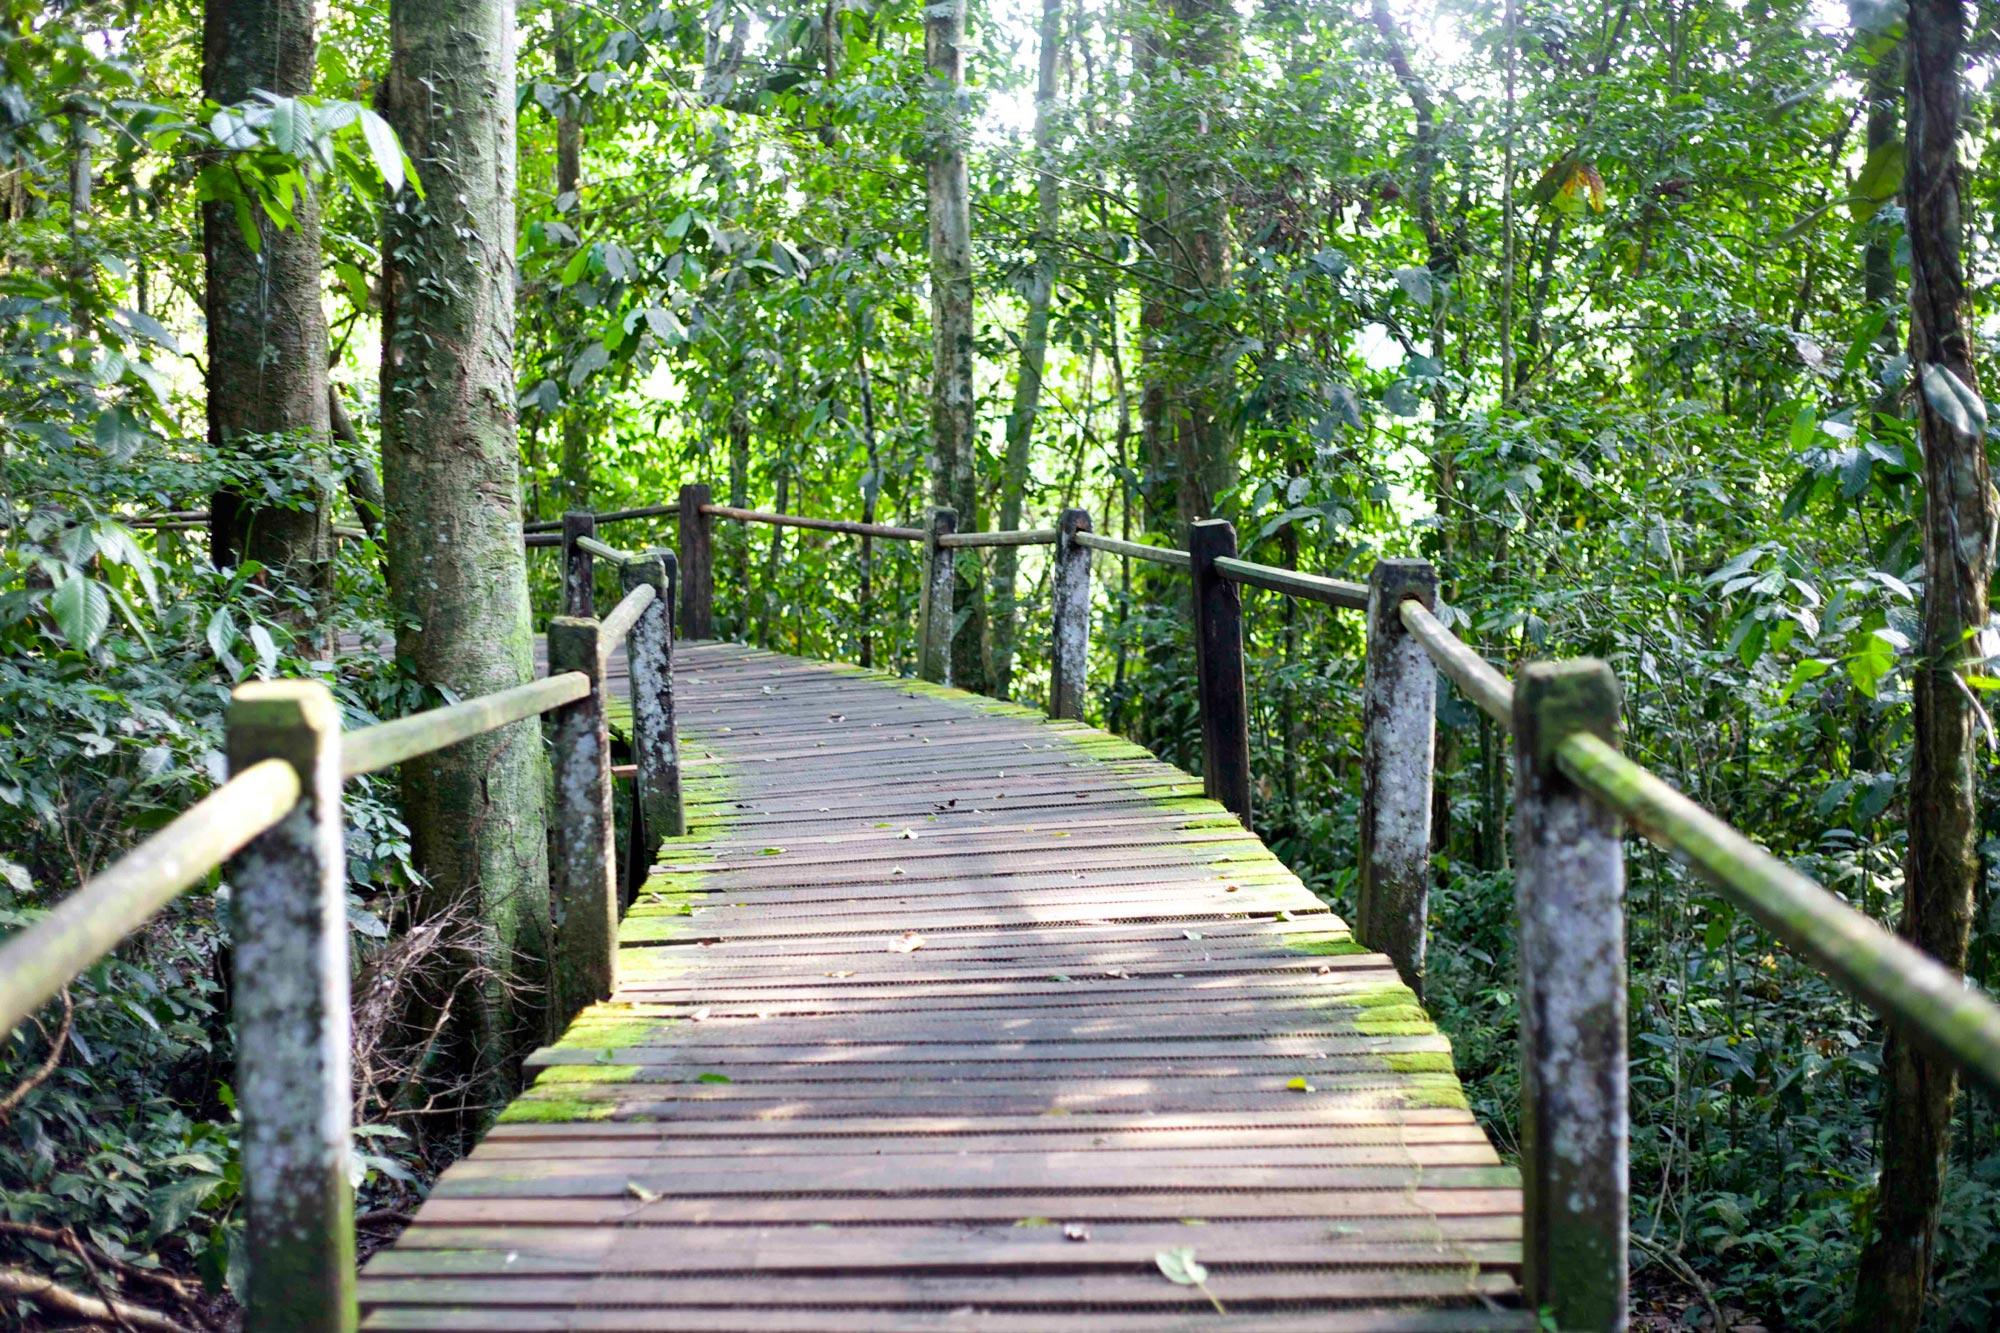 Travel in the Amazon Rainforest | Gondwana Ecotours